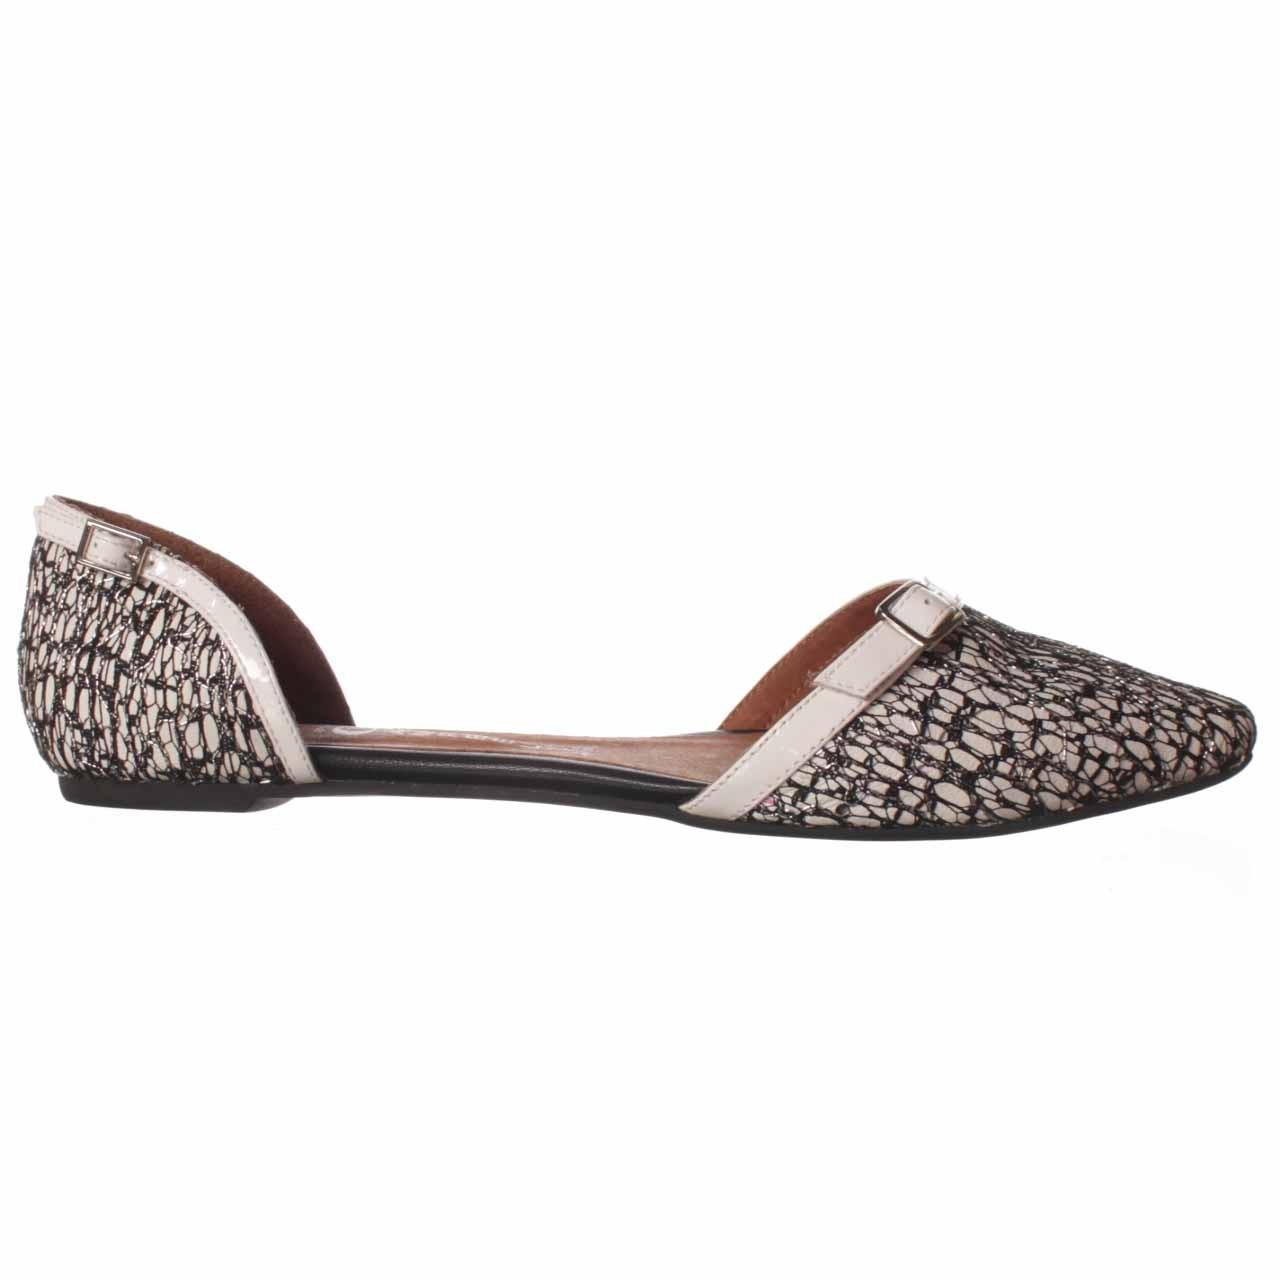 jeffrey cbell flat shoes - 28 images